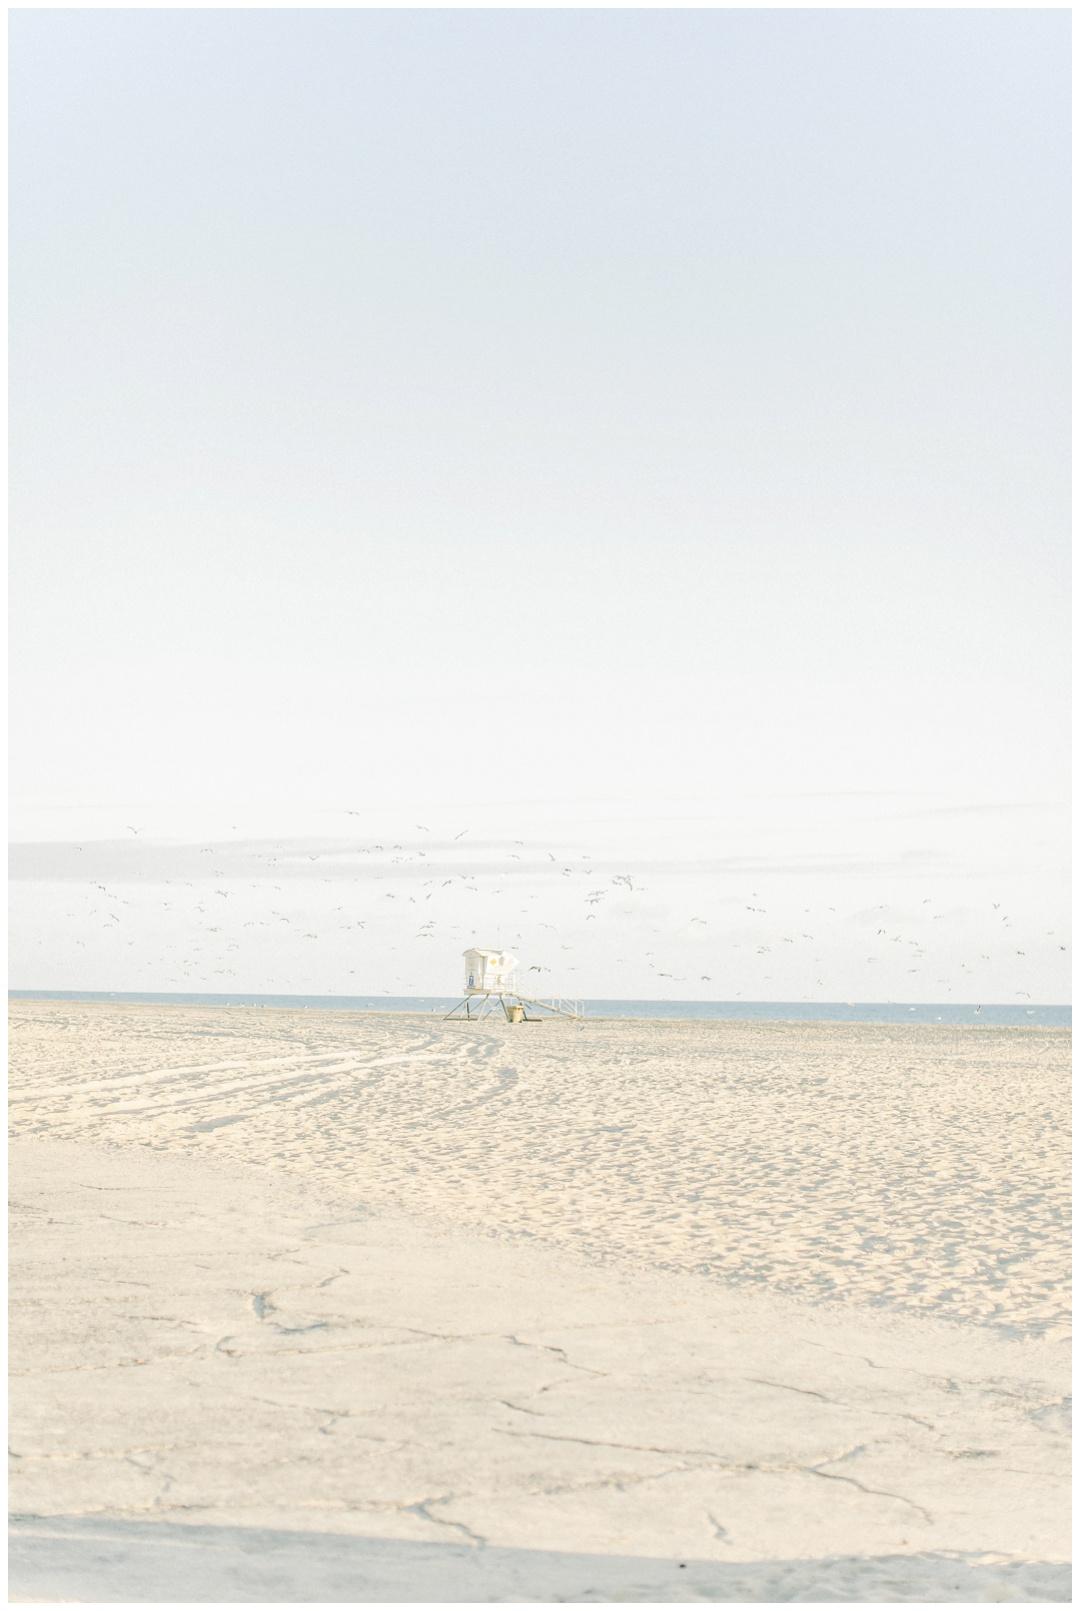 Newport_Beach_Family_Photographer_Newport_Beach_Newborn_Photographer_Orange_County_Family_Photographer_Cori_Kleckner_Photography_Huntington_Beach_San_Clemente_Family_Session_Photography__2331.jpg